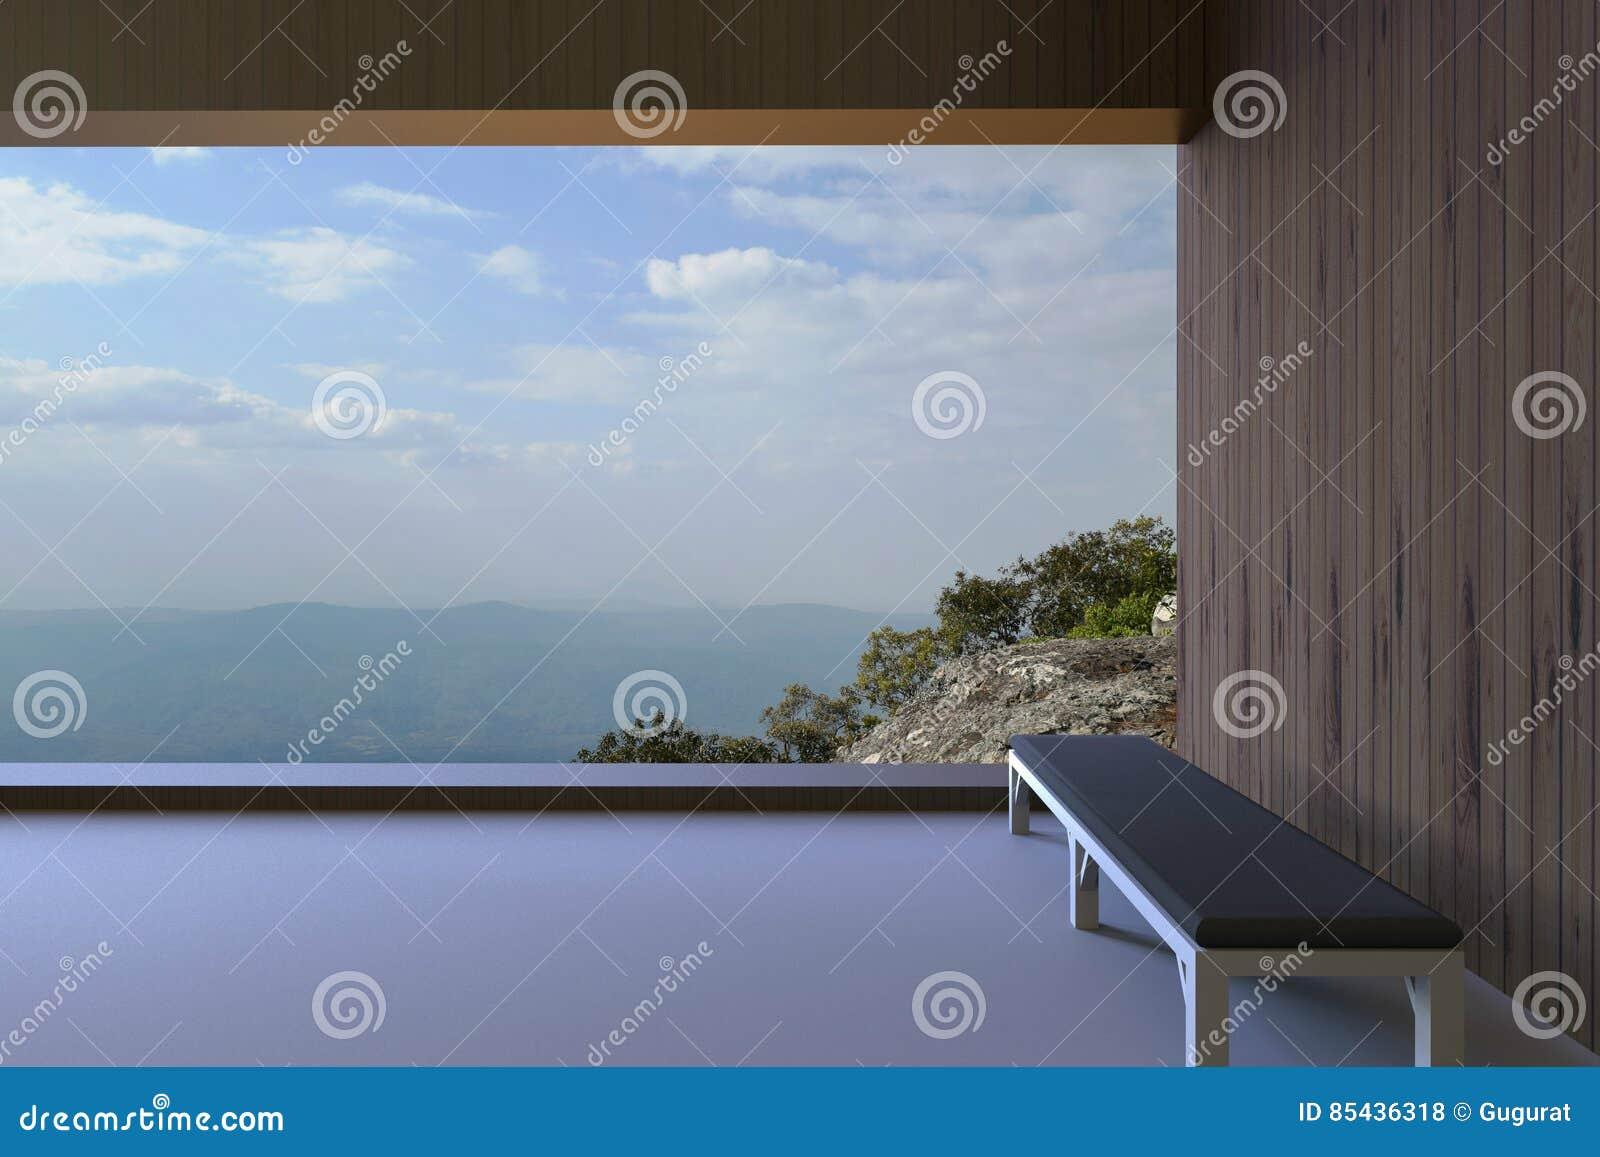 stanze moderne stanze moderne semplici e pareti di legno e una sedia